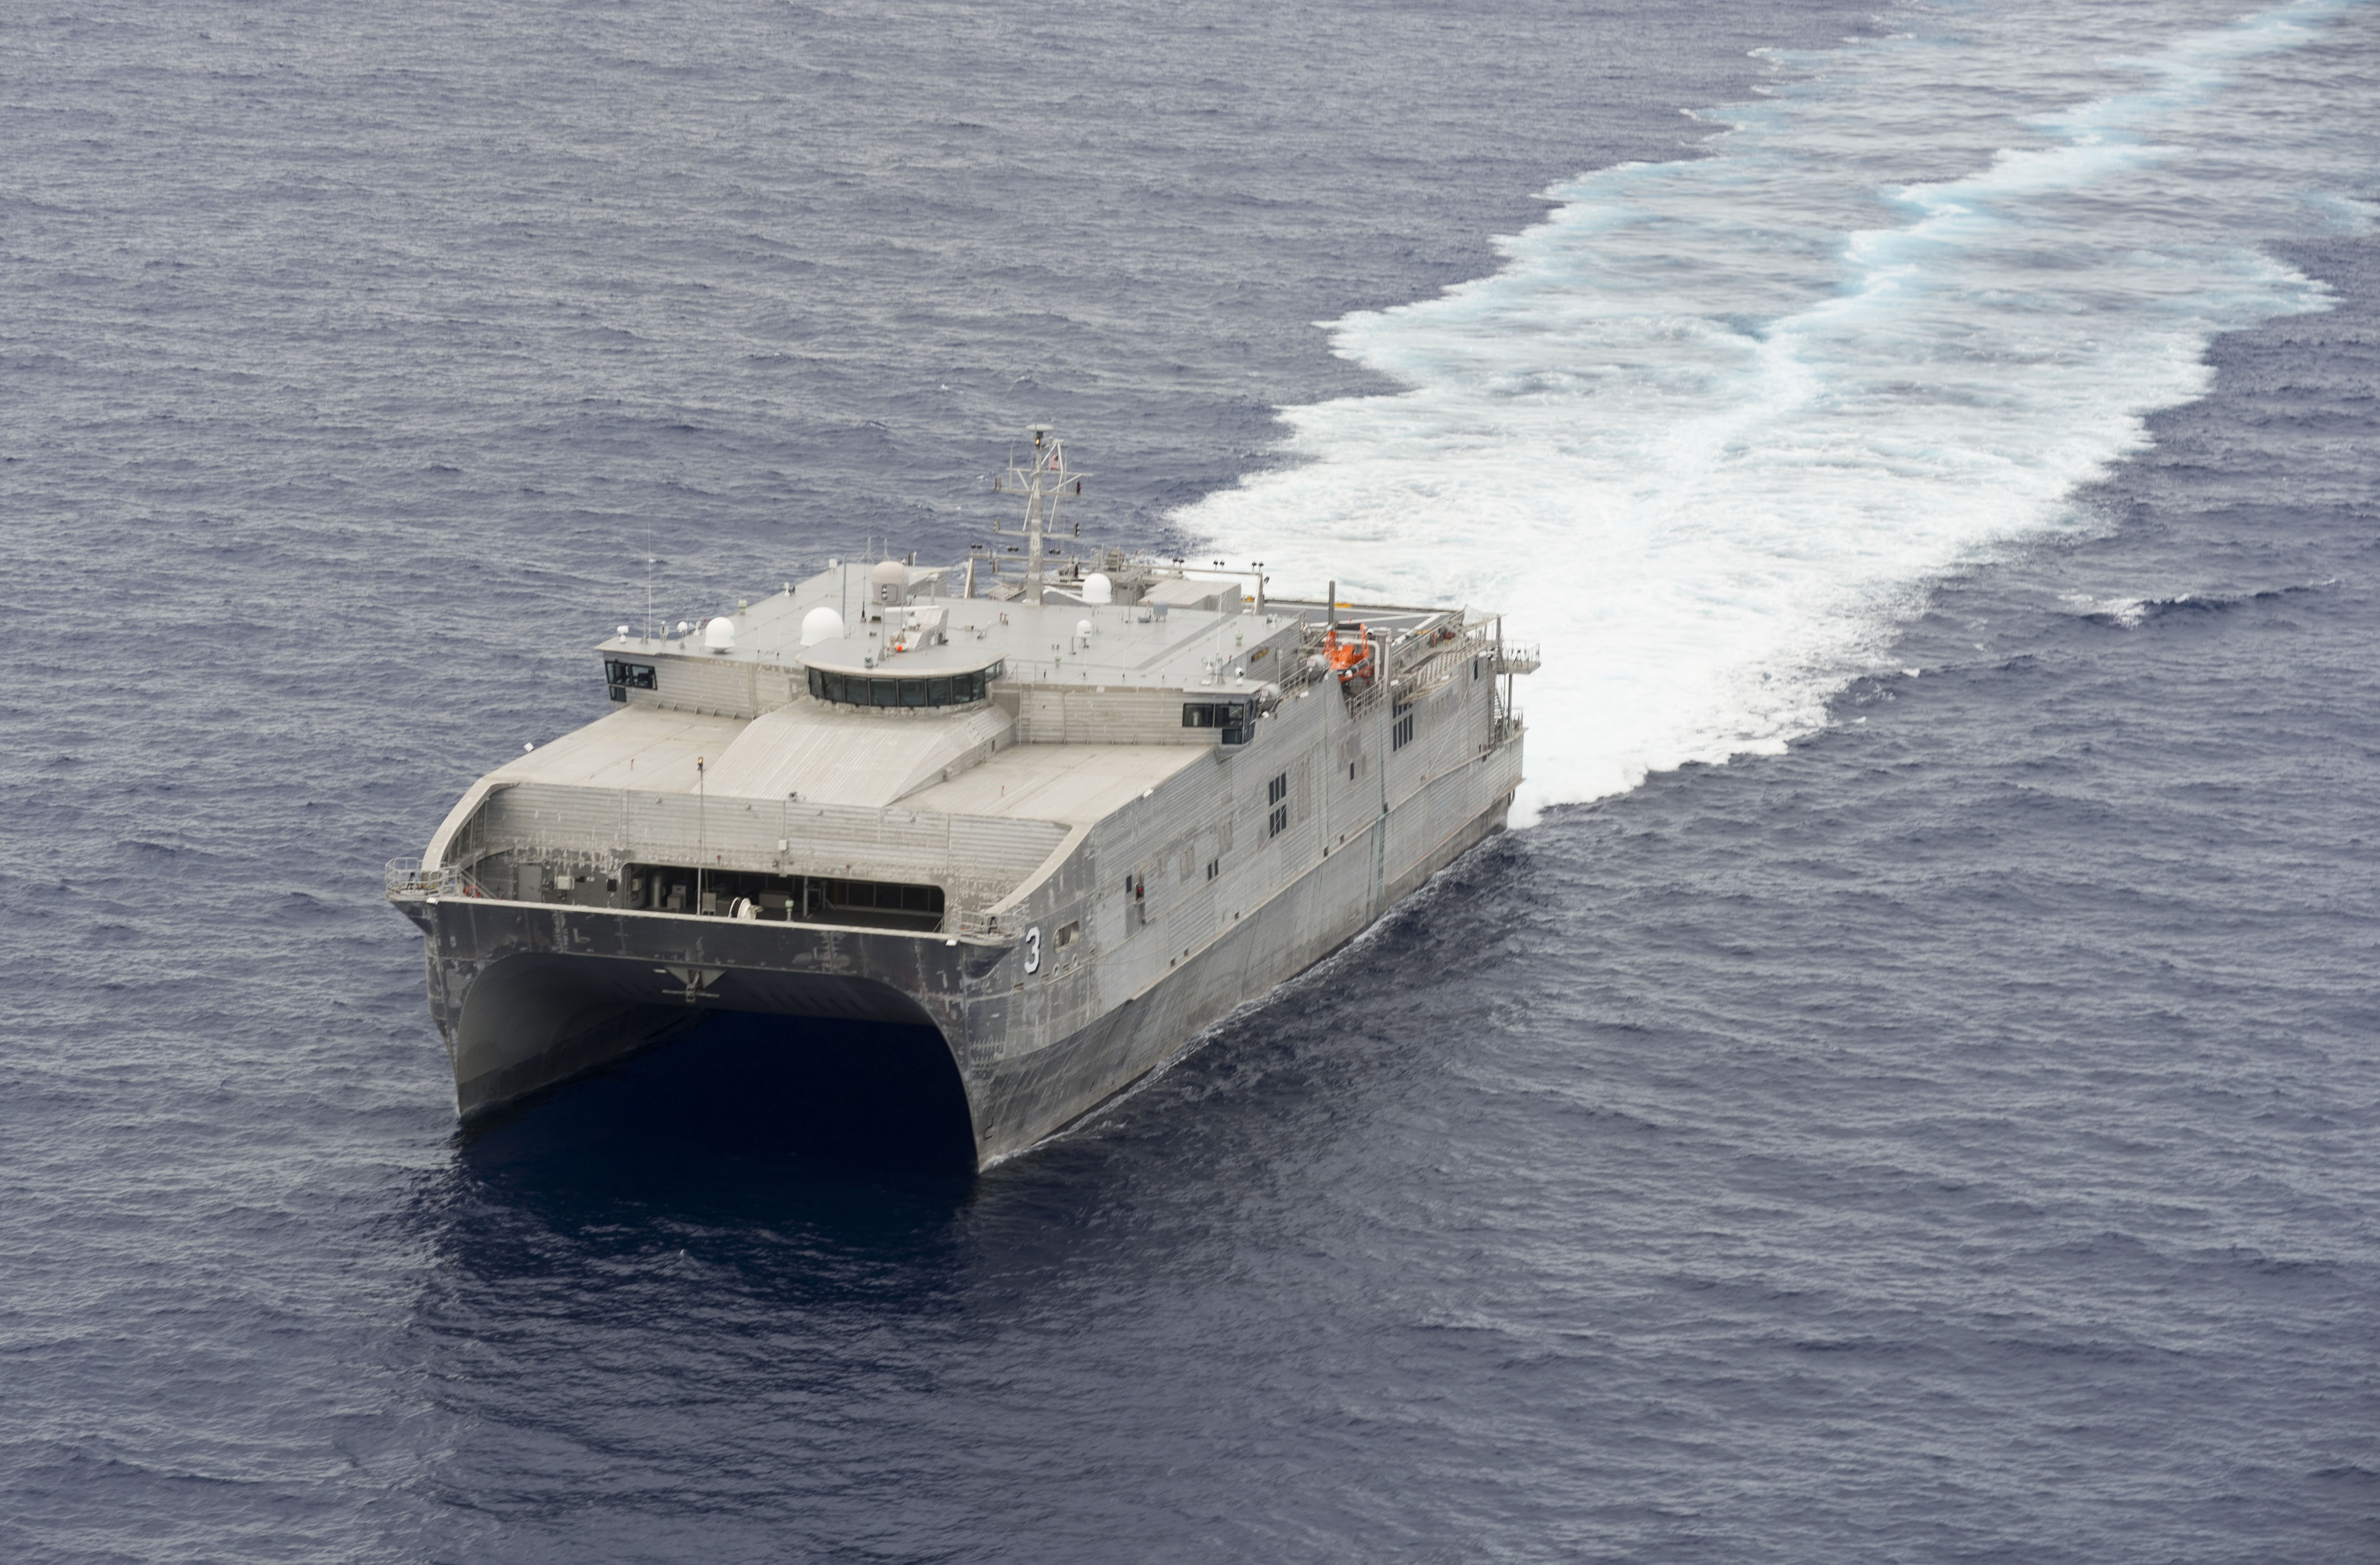 USNS Millinocket (JHSV-3) underway in May 2015.